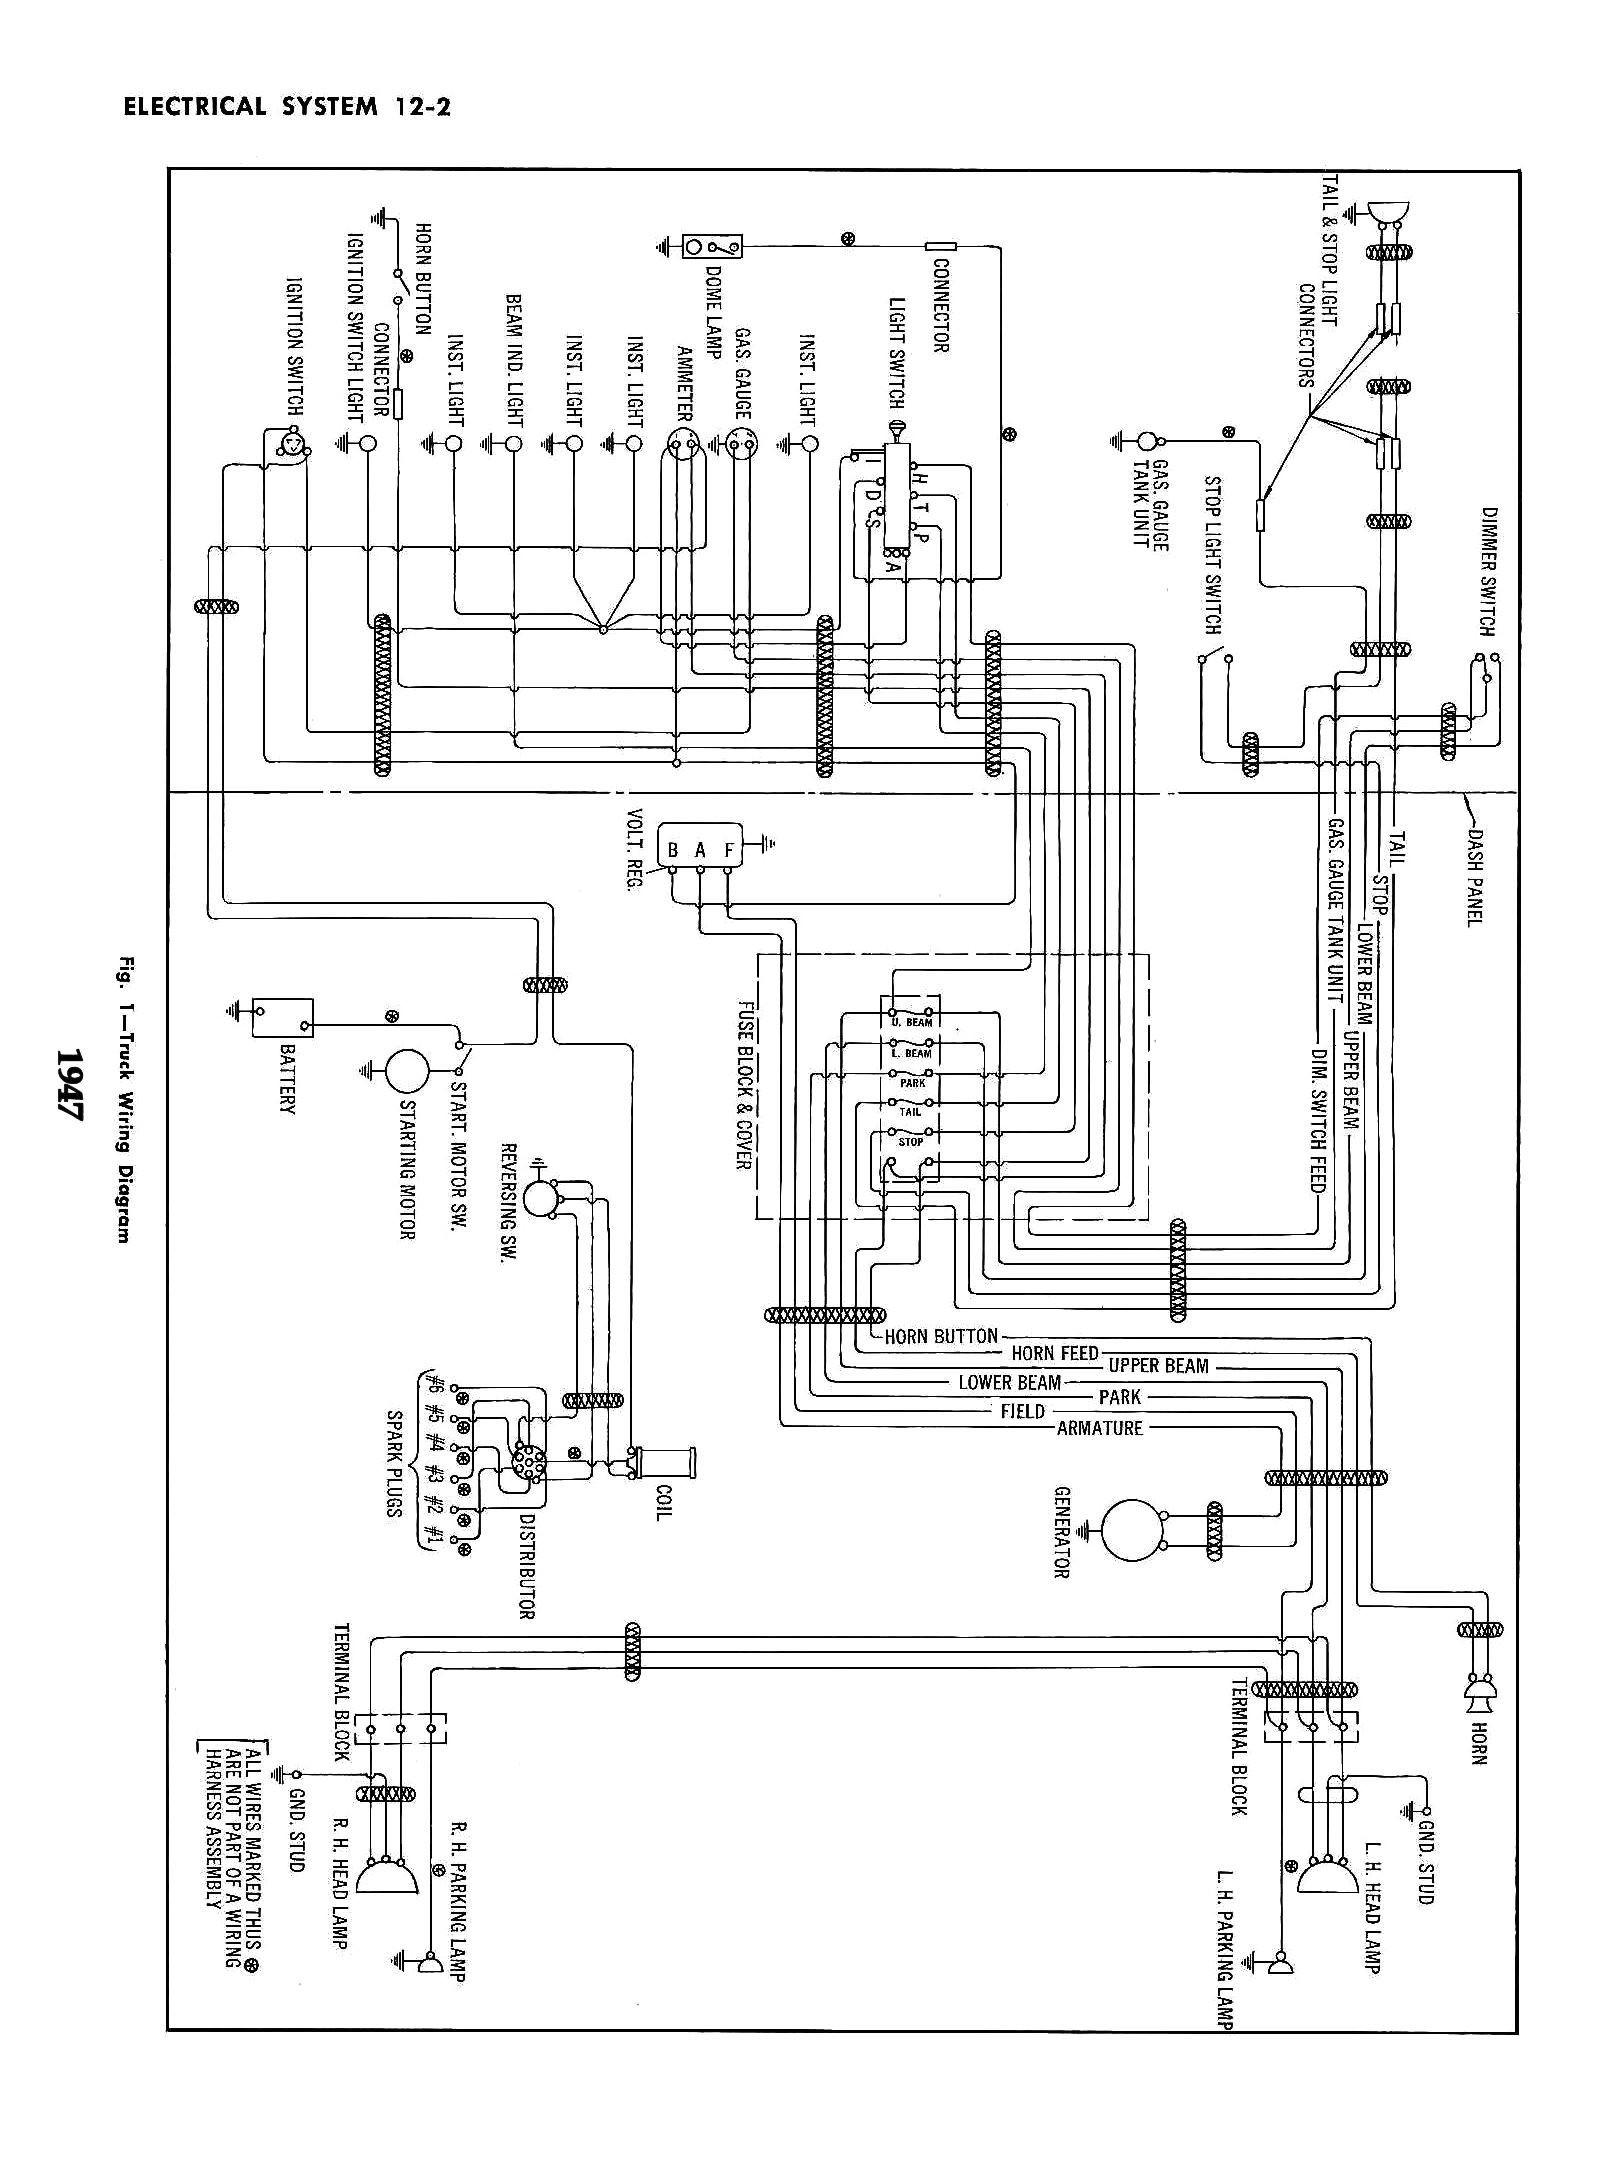 1979 ford 3600 wiring diagram